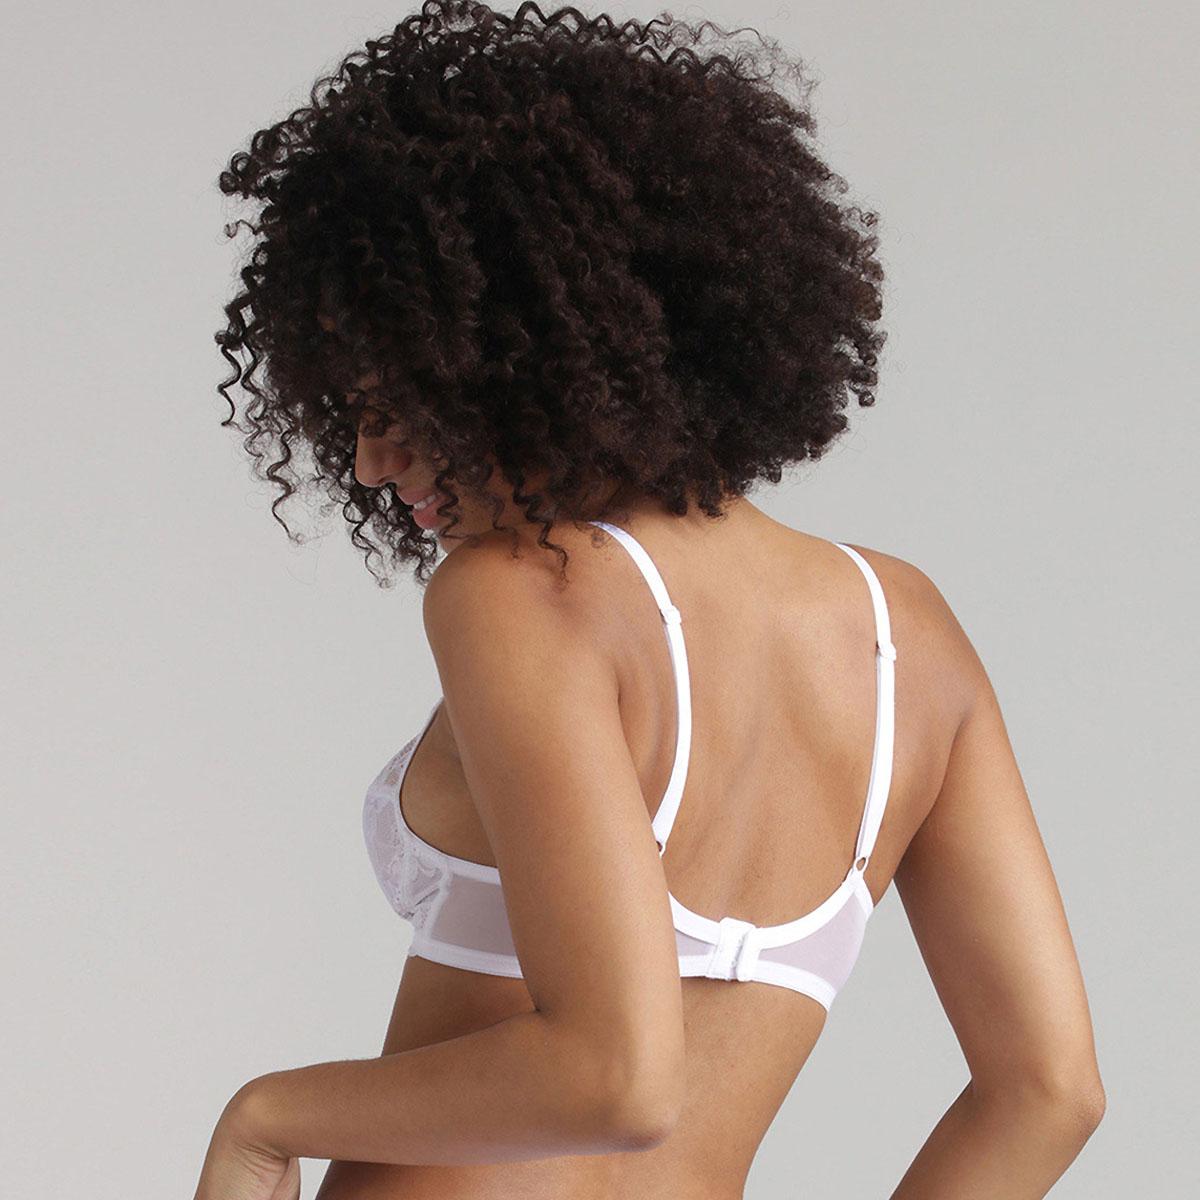 Reggiseno modellante senza ferretto bianco Essential Elegance, , PLAYTEX